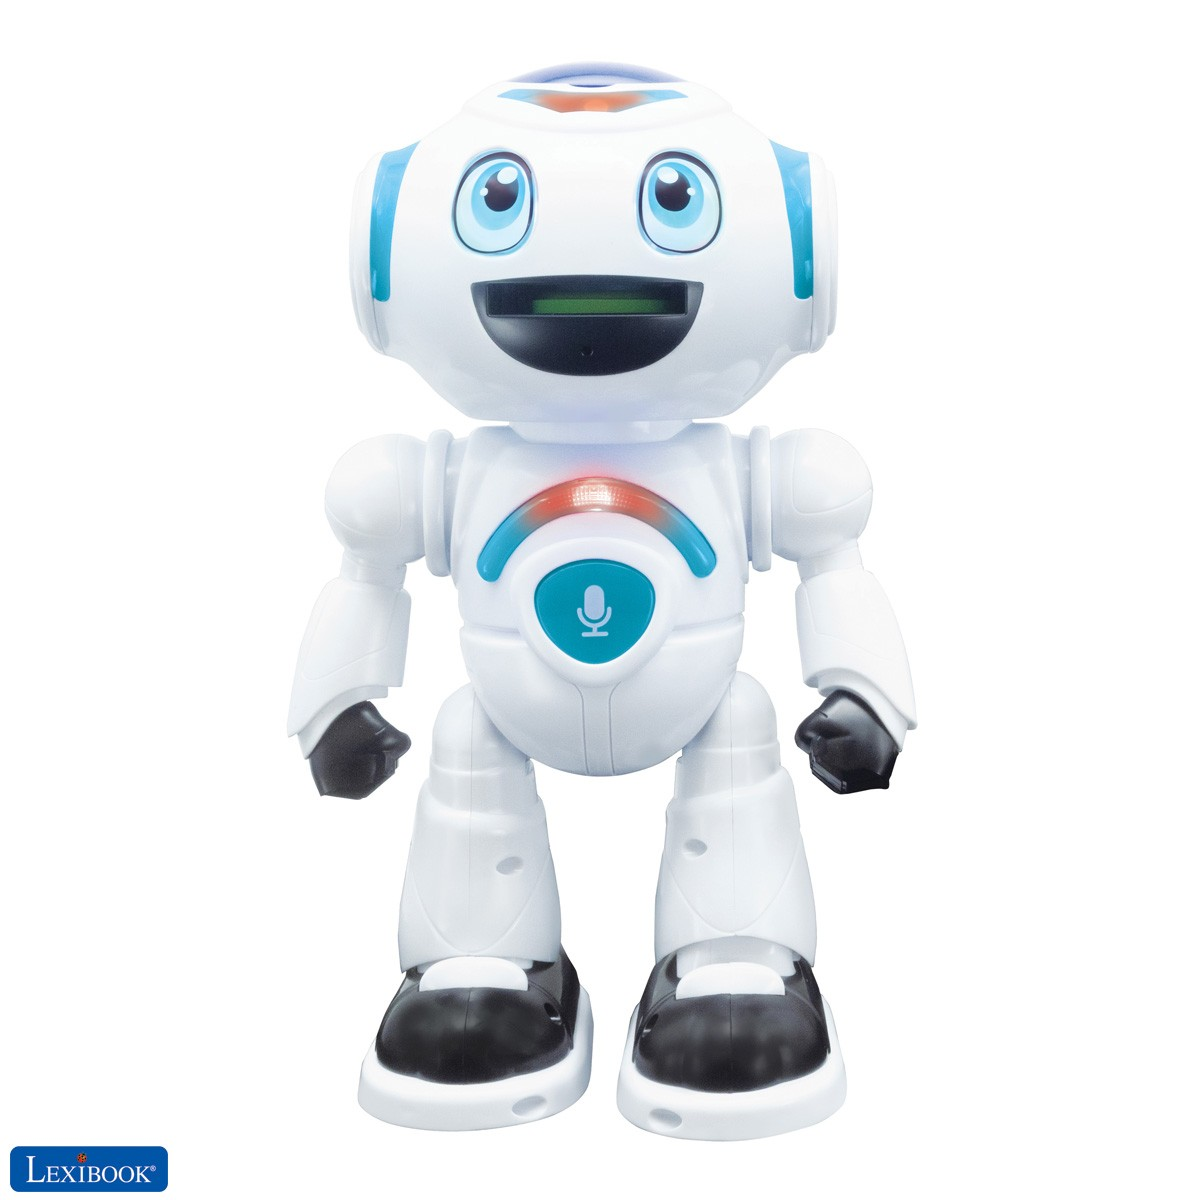 Powerman Master Interactive Toy Robot